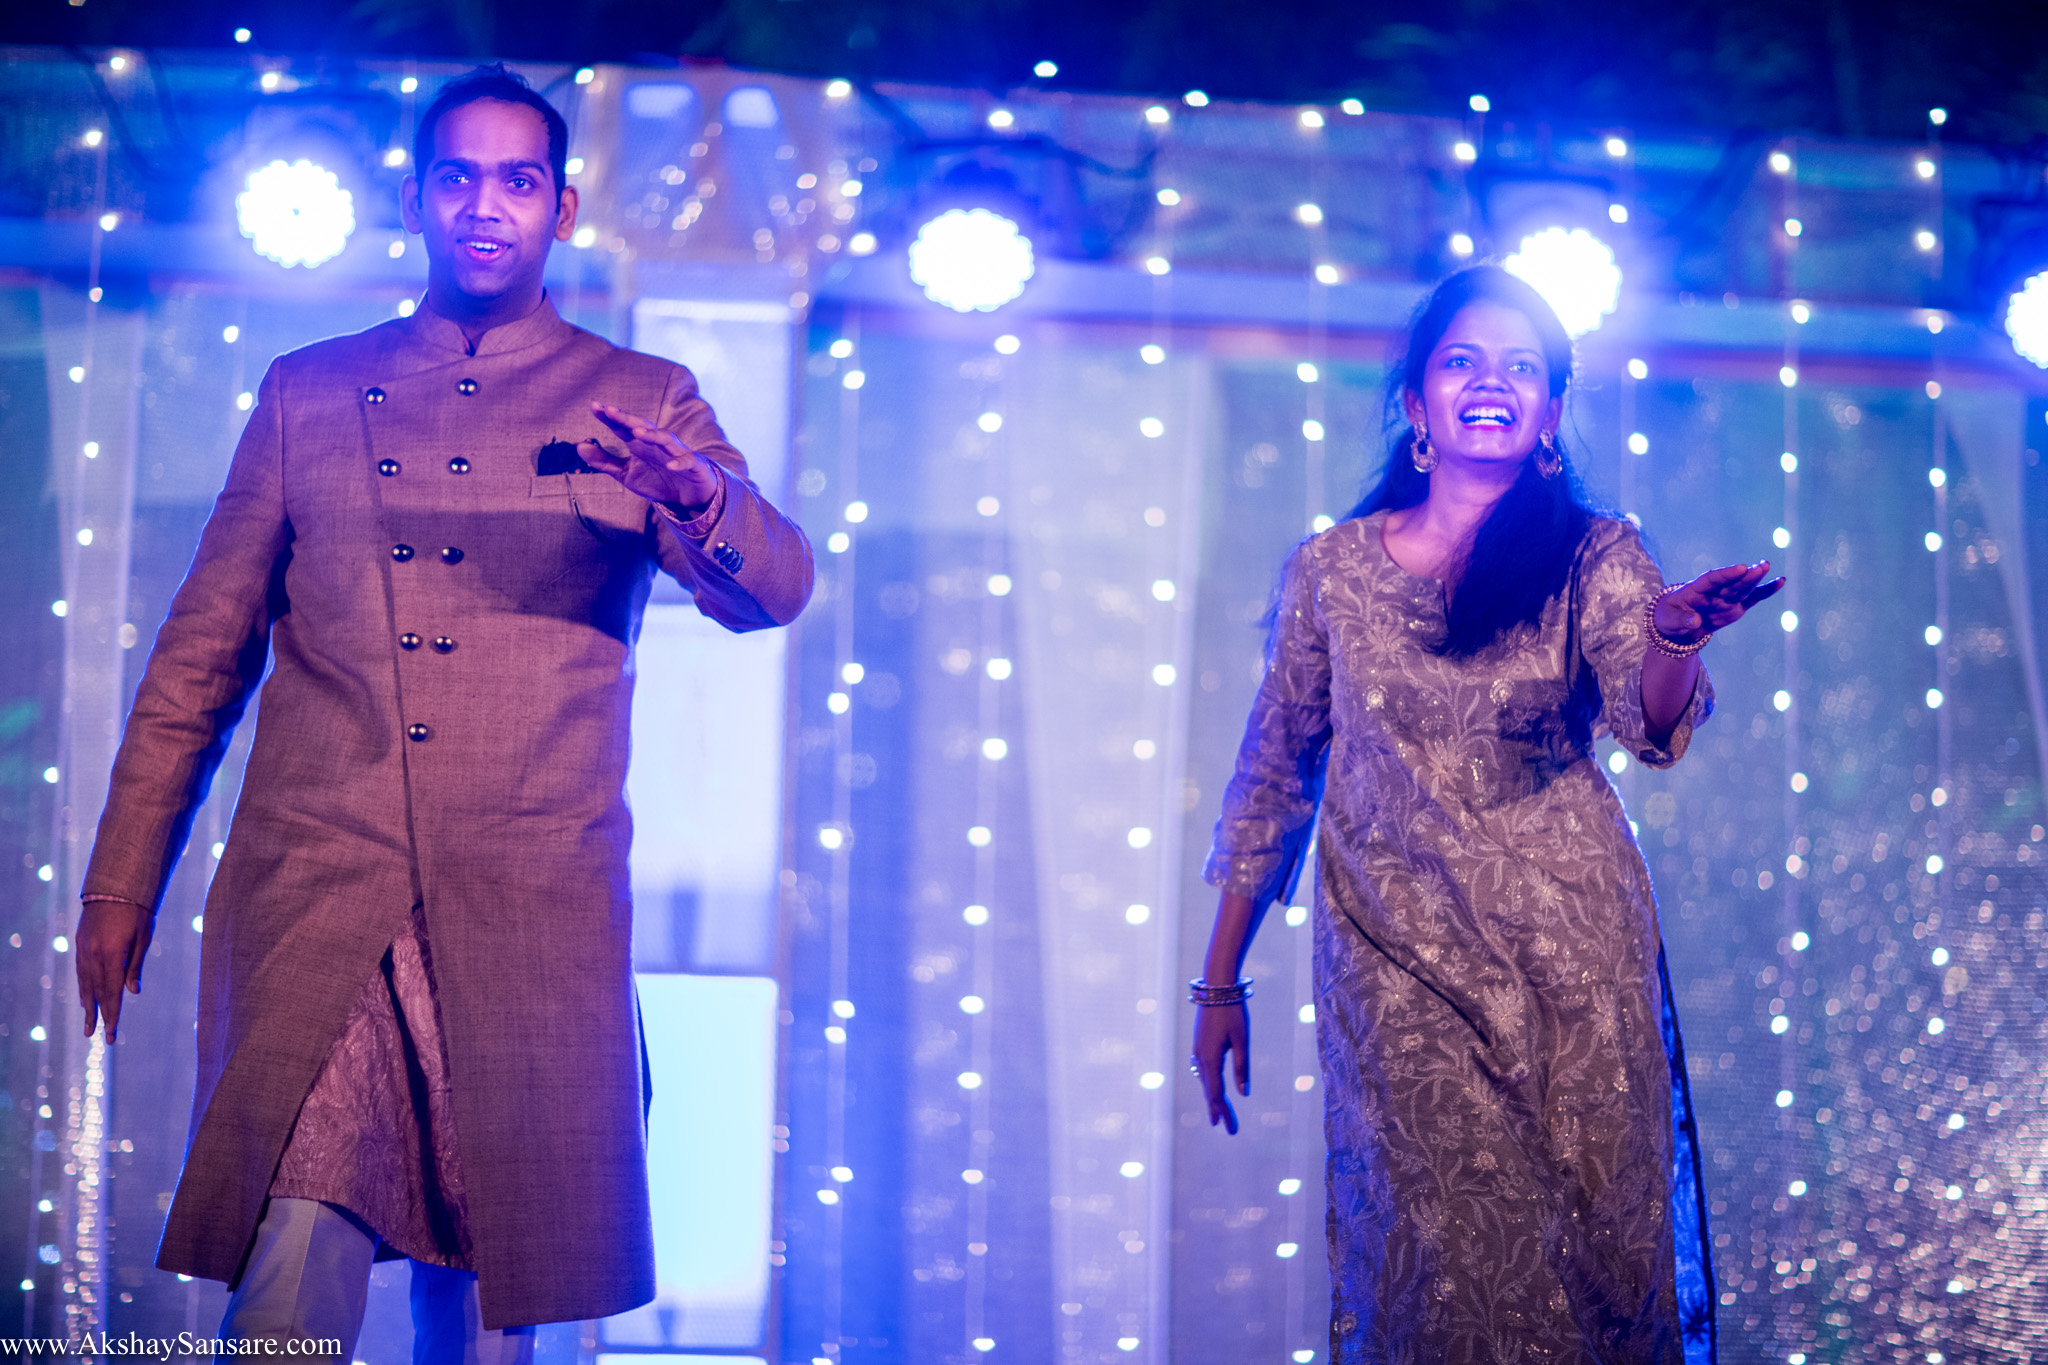 Salil x Kimaya Akshay Sansare Photography Candid wedding Photographer in mumbai best(4).jpg